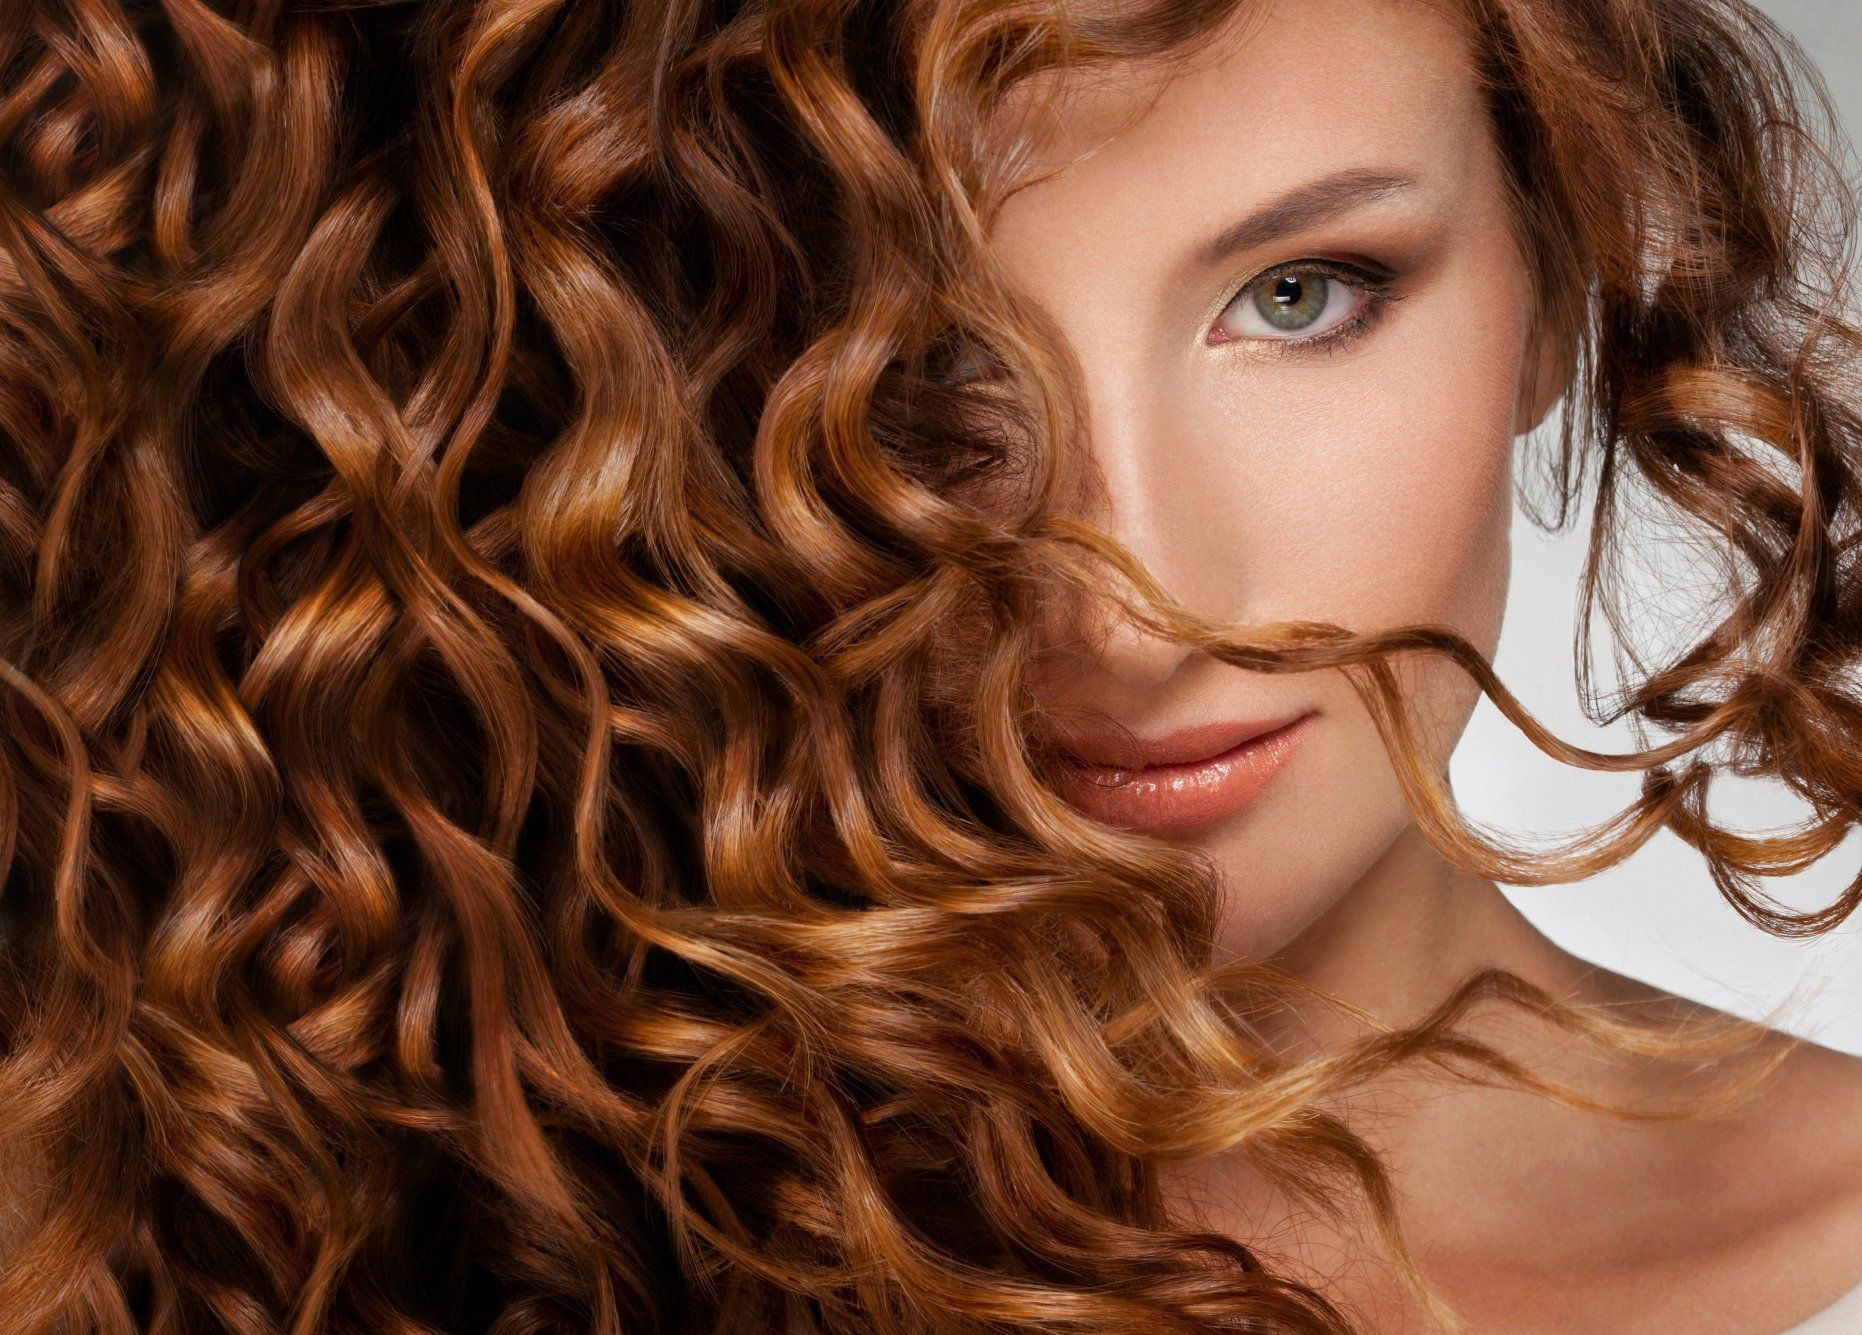 Typesofpermforlonghairg hair color pinterest